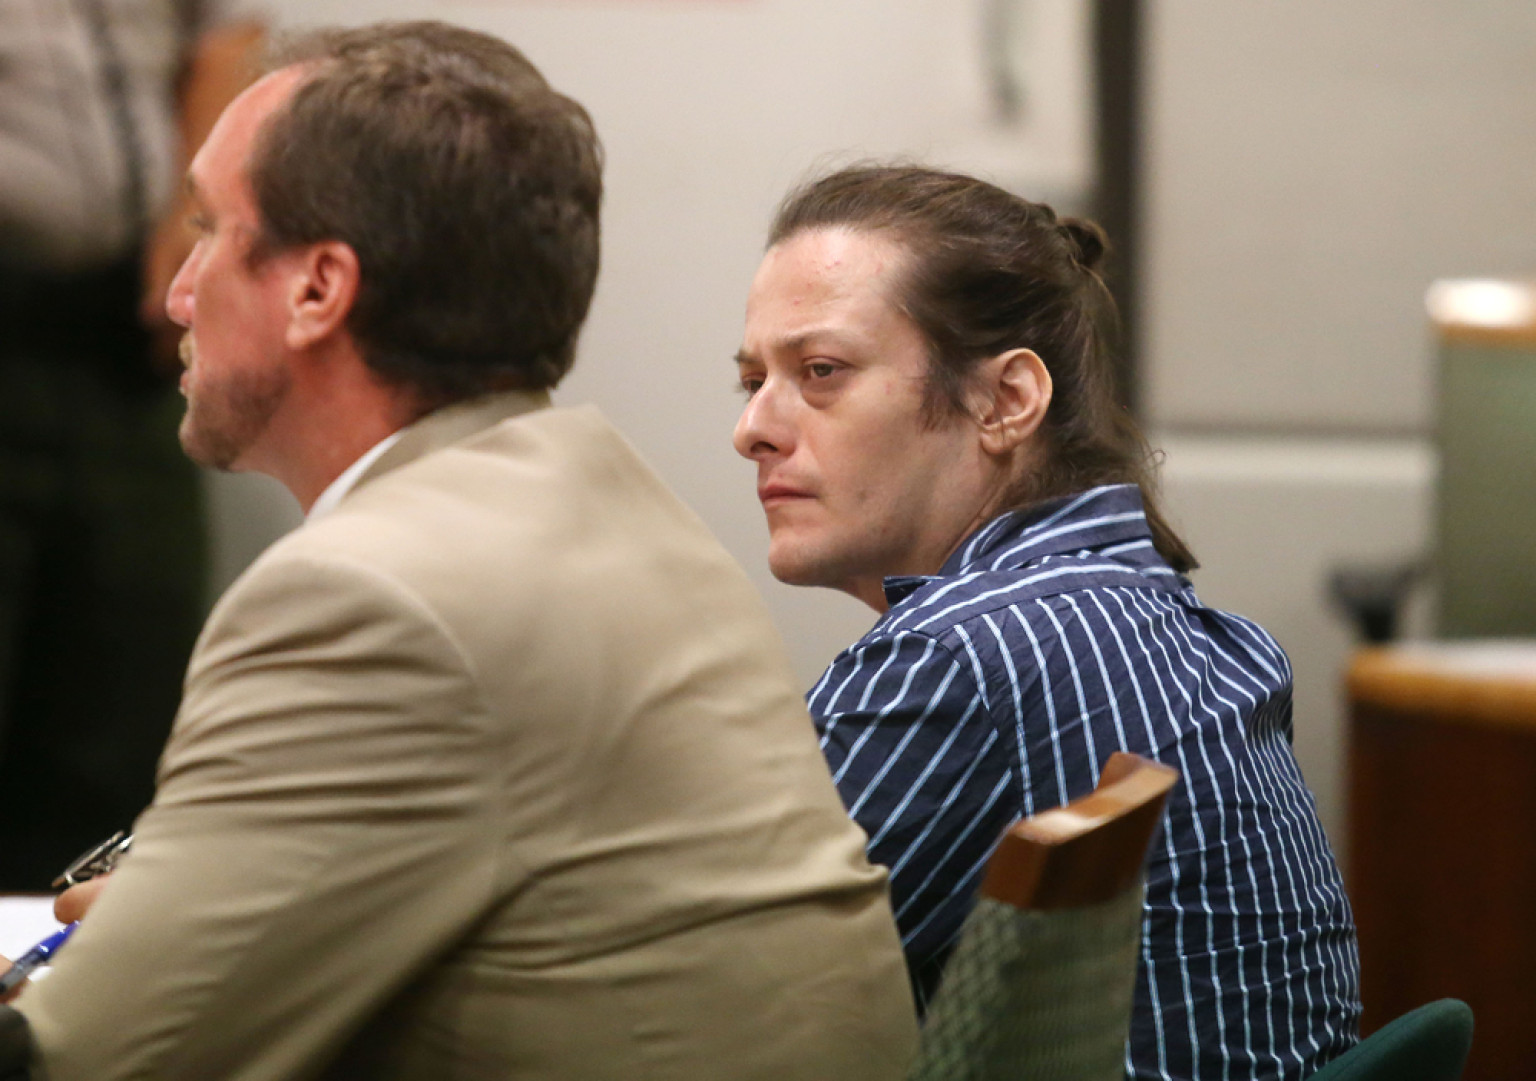 Edward Furlong Pleads No Contest In Domestic Violence Case Report Huffpost